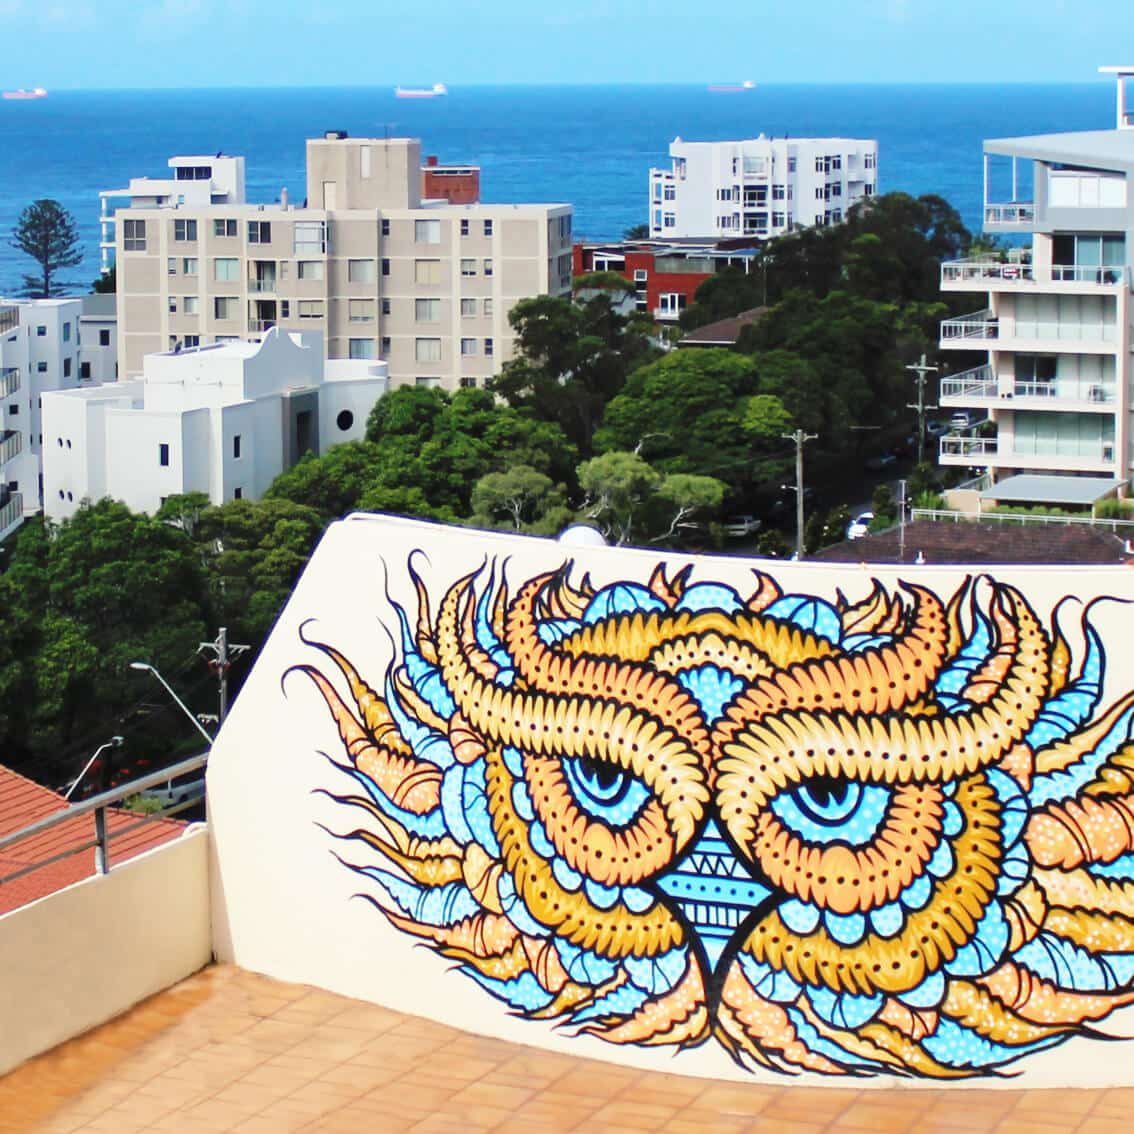 rooftop street art